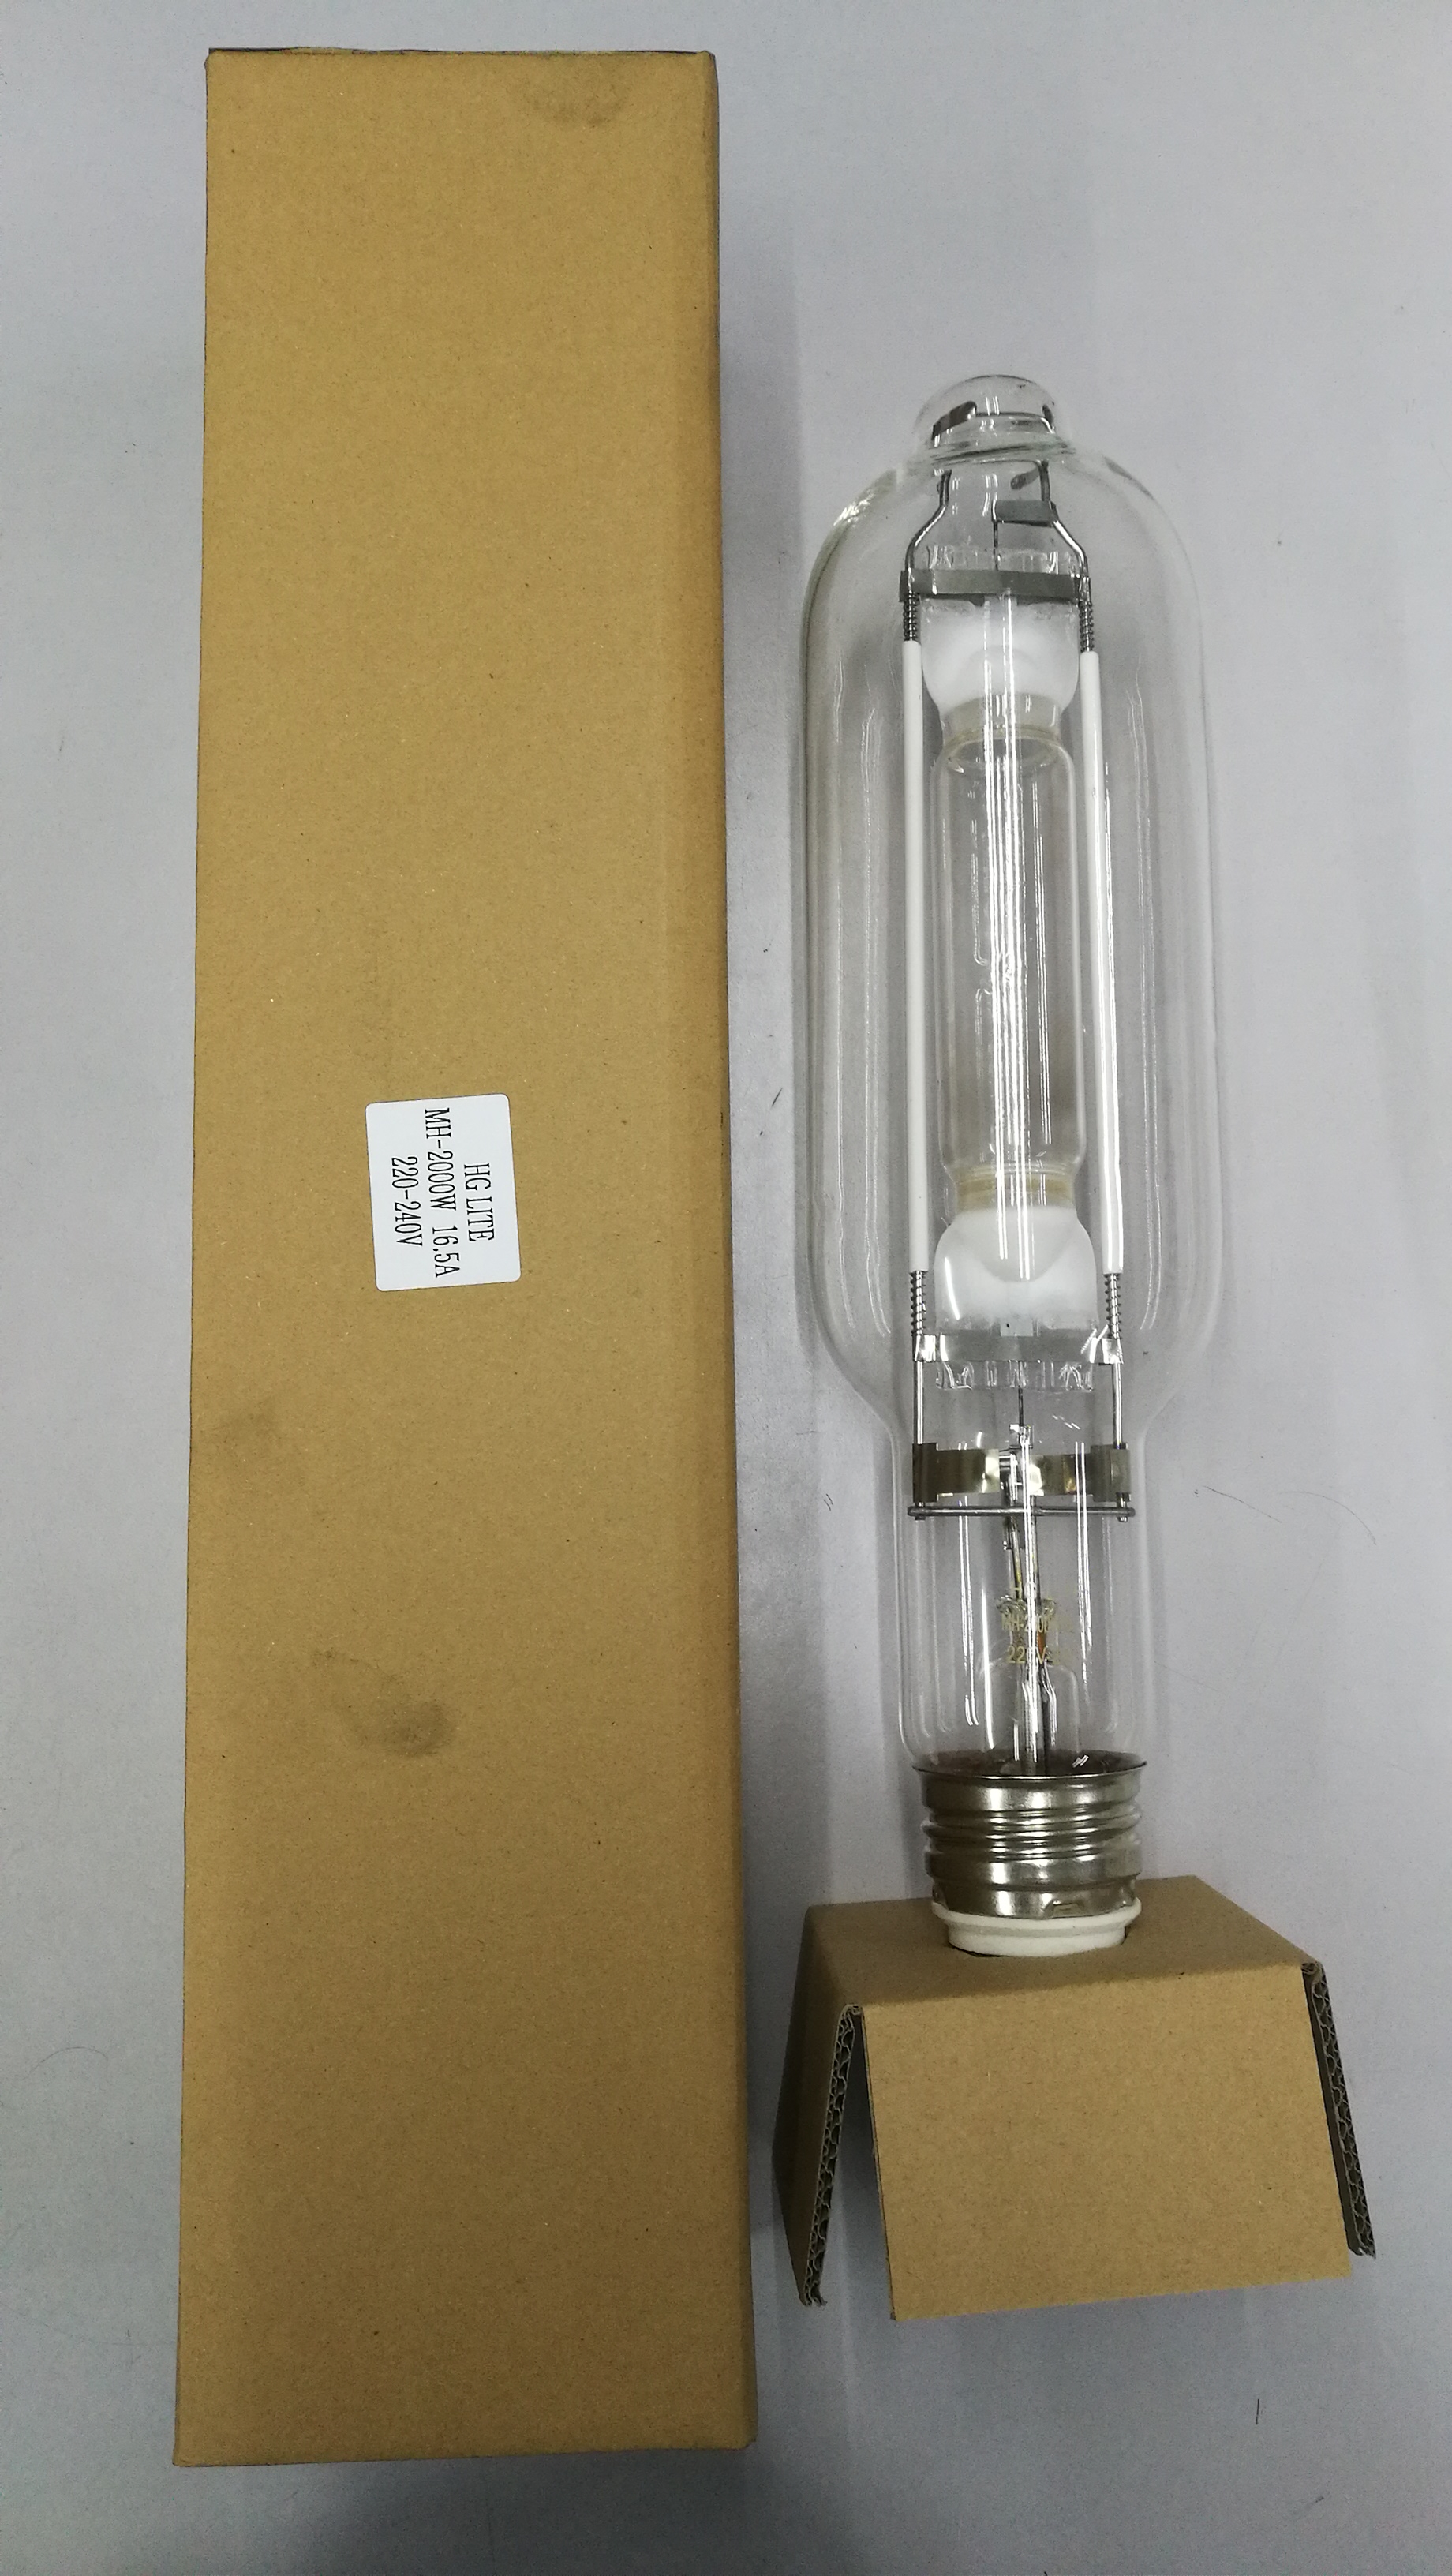 Hg-lite mh-2000w e40 16.5A metal halide bulb